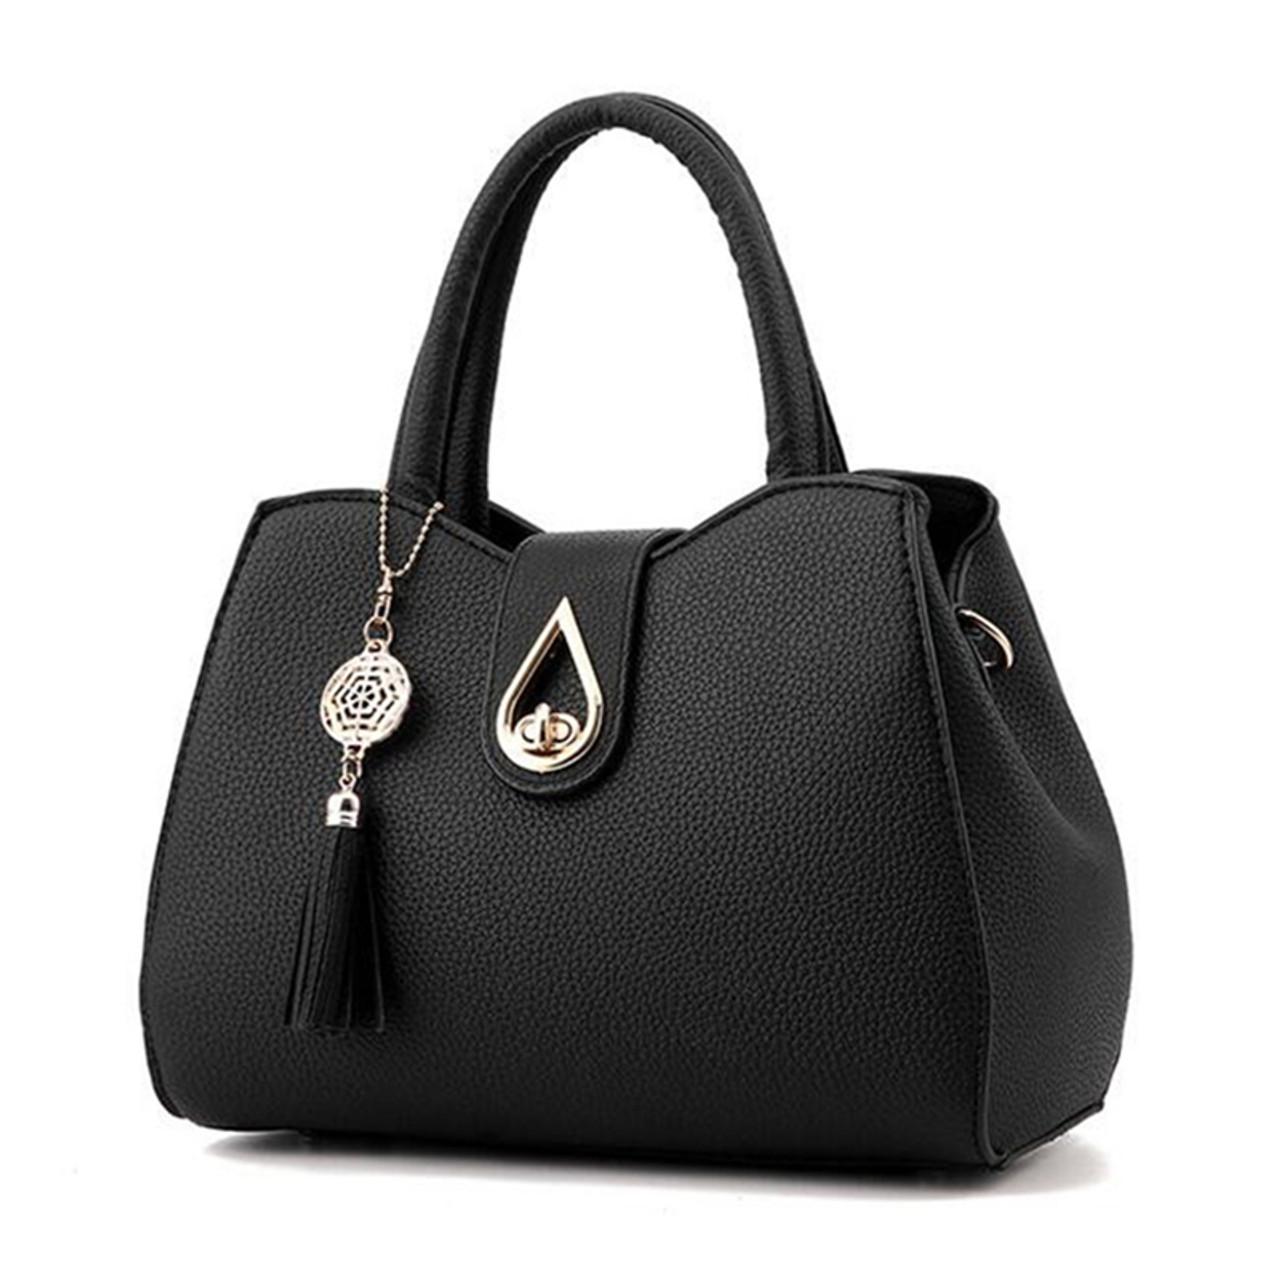 dc57fd5ae7a Famous Brand Women Bag Top-Handle Bags 2019 Fashion Women Messenger Bags  Handbag Set PU Leather totes Bag